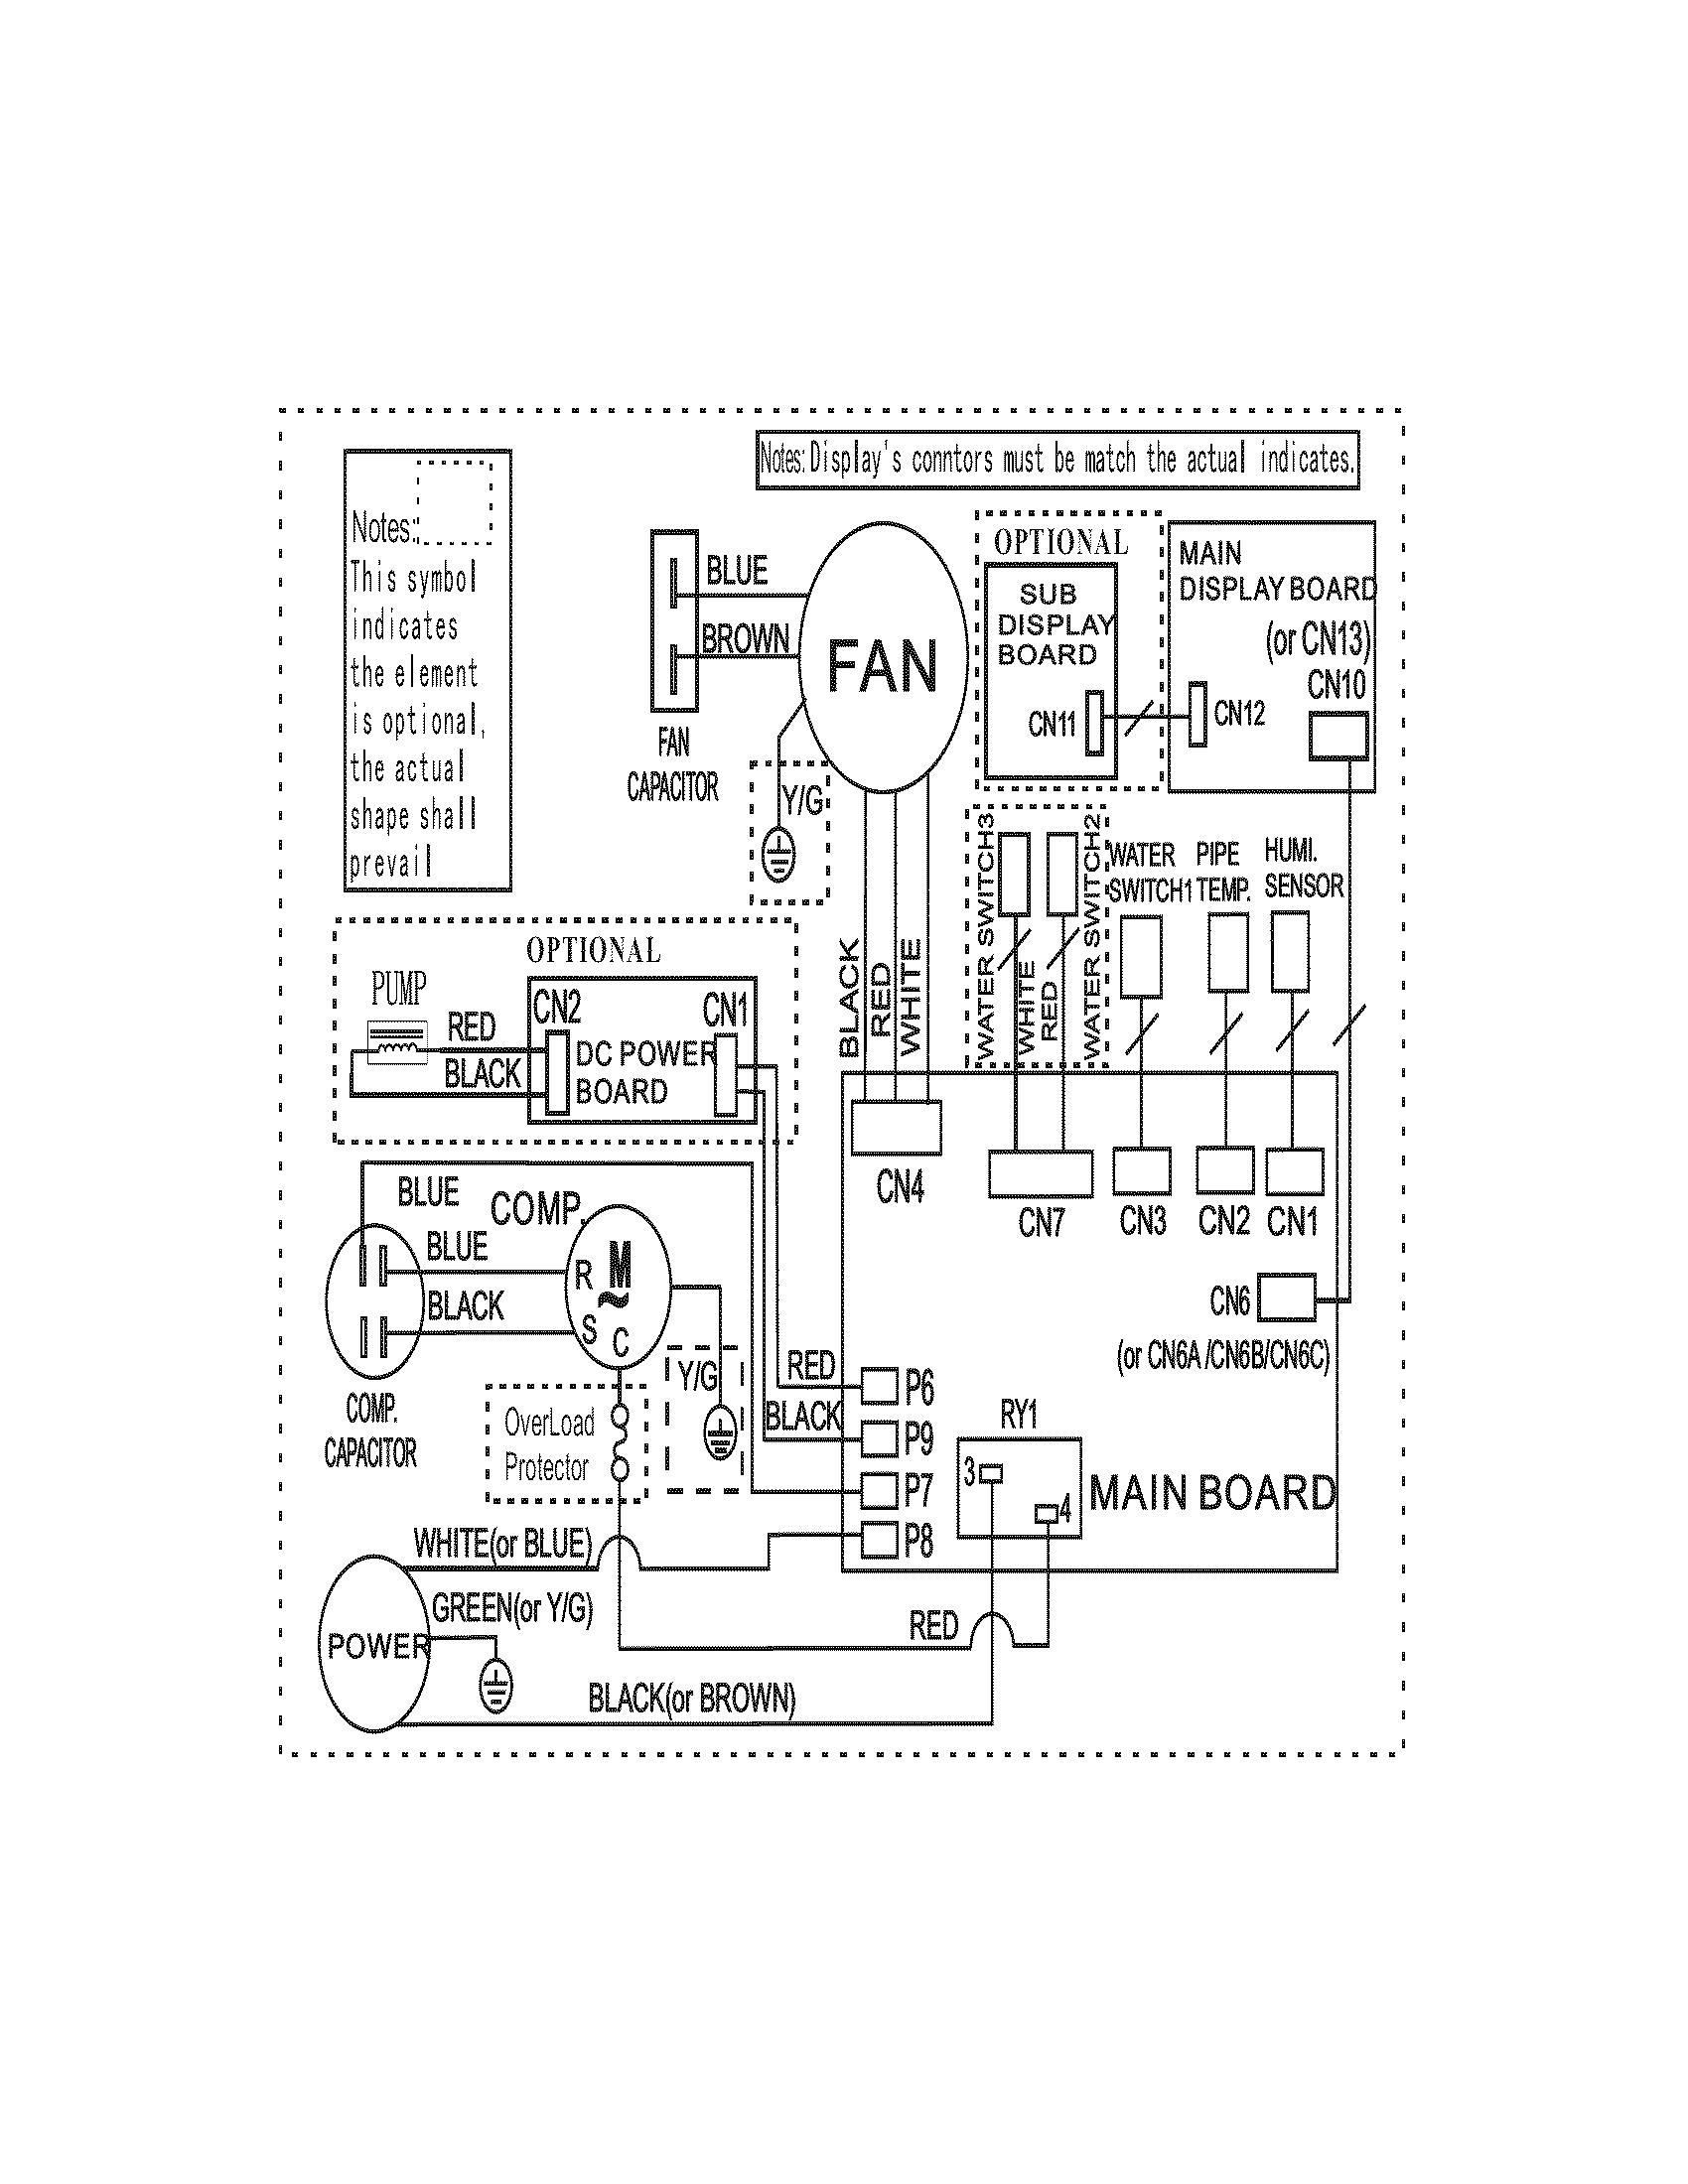 Crosley dehumidifier parts model cdf700w11 sears partsdirect crosley wiring diagram 27 at basic electrical wiring diagrams